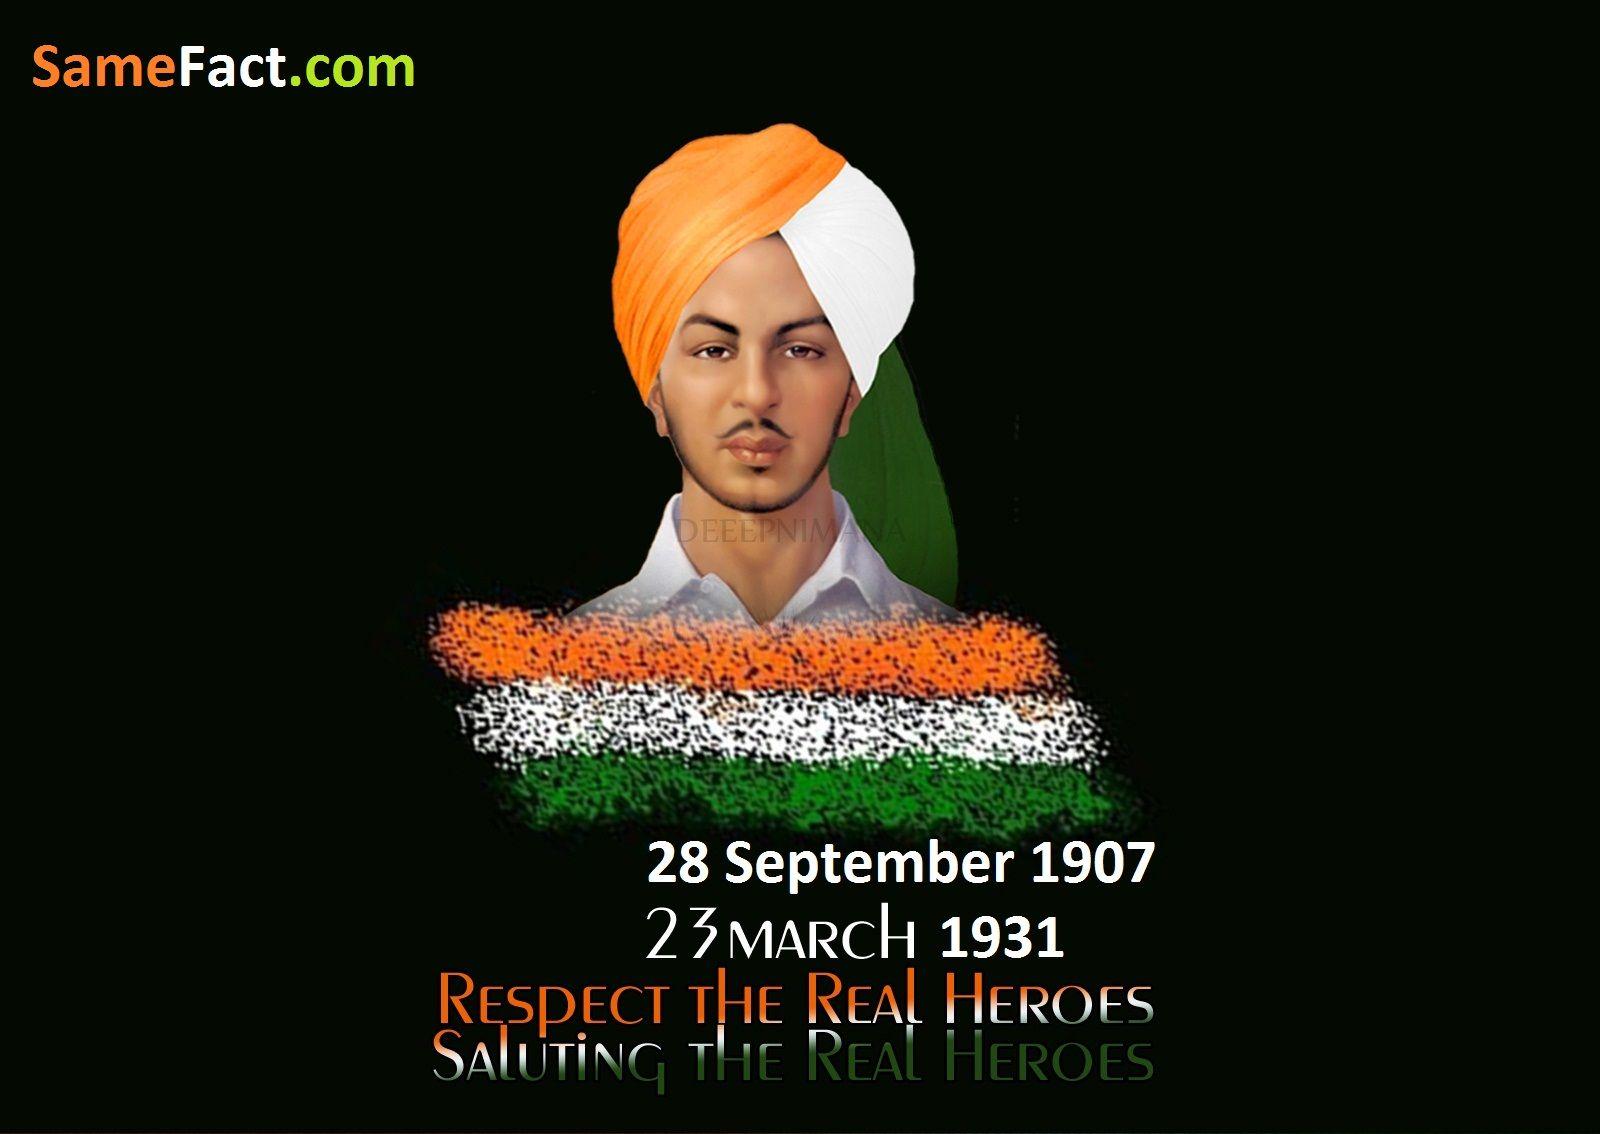 Free Download Hd Wallpaper For Bhagat Singh Samefactcom Www